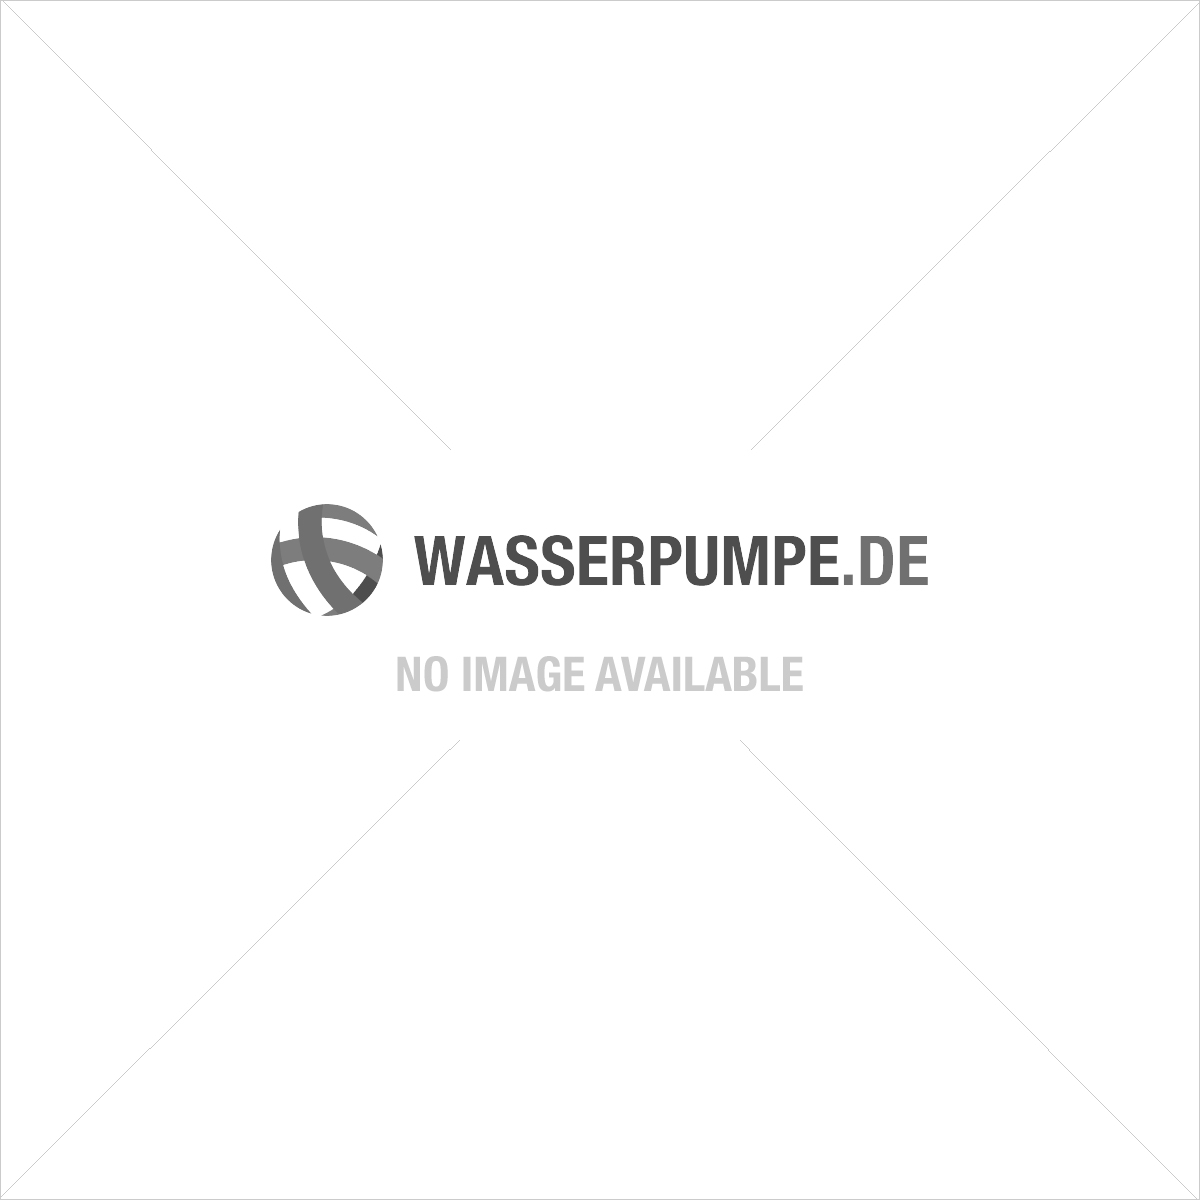 DAB Fekabox 200 Abfallwasserhebeanlage-Paket